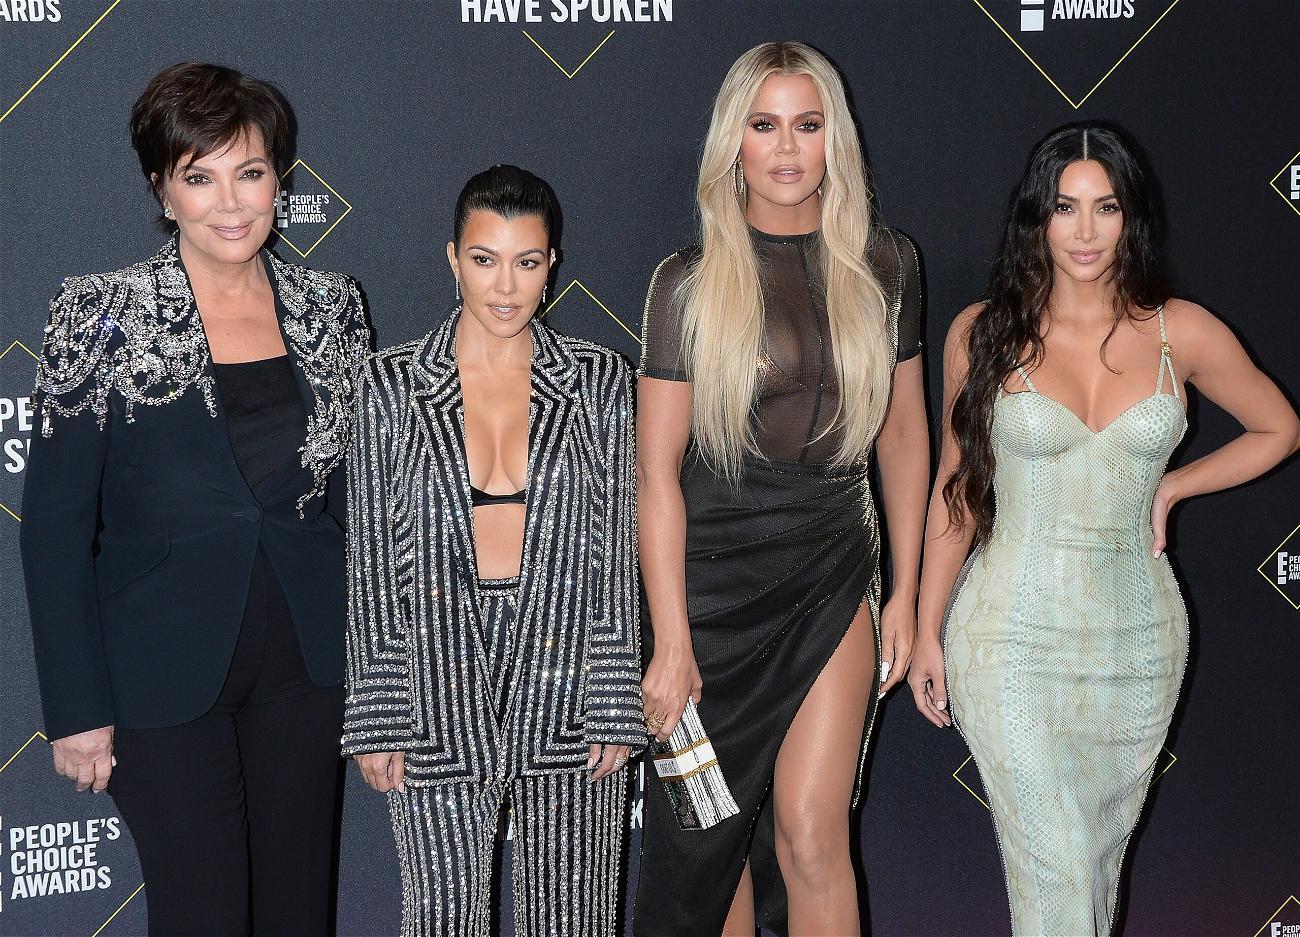 Kris Jenner's Alleged Victim Seeks $3 Million In Sexual Assault Lawsuit